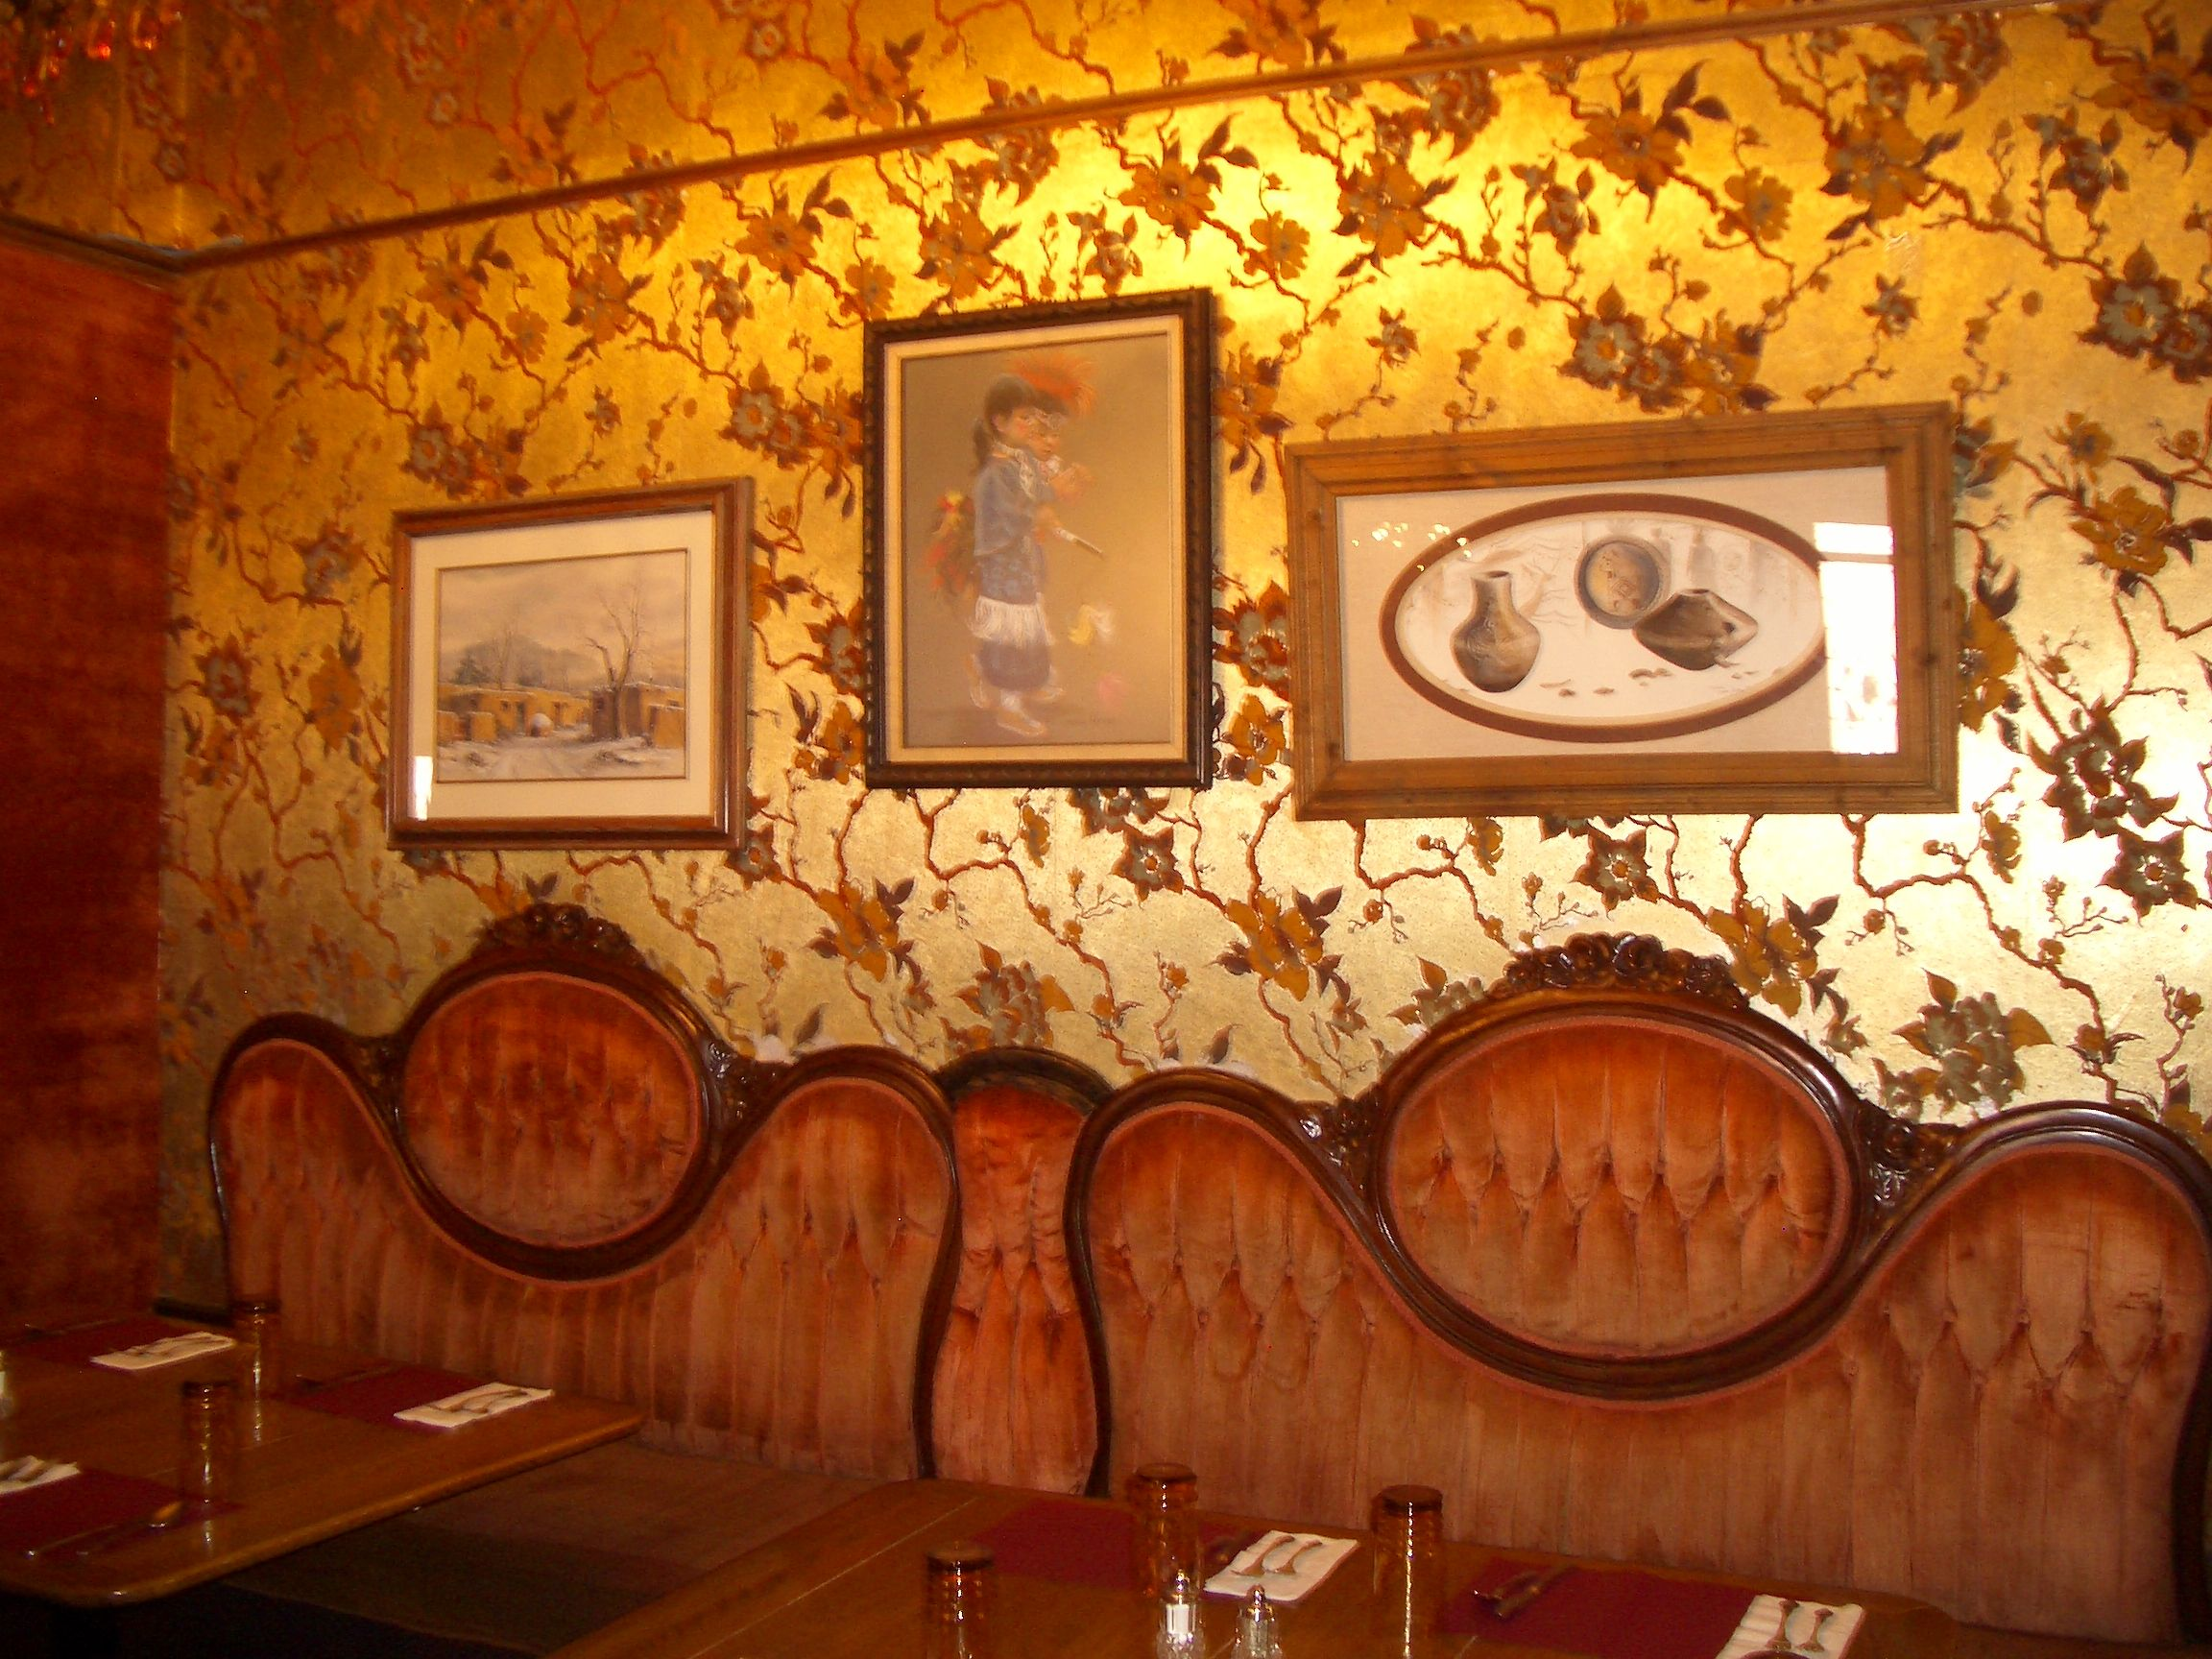 The Eklund Hotel In My Home Town Clayton Nm Puckered Velvet Booth Seats